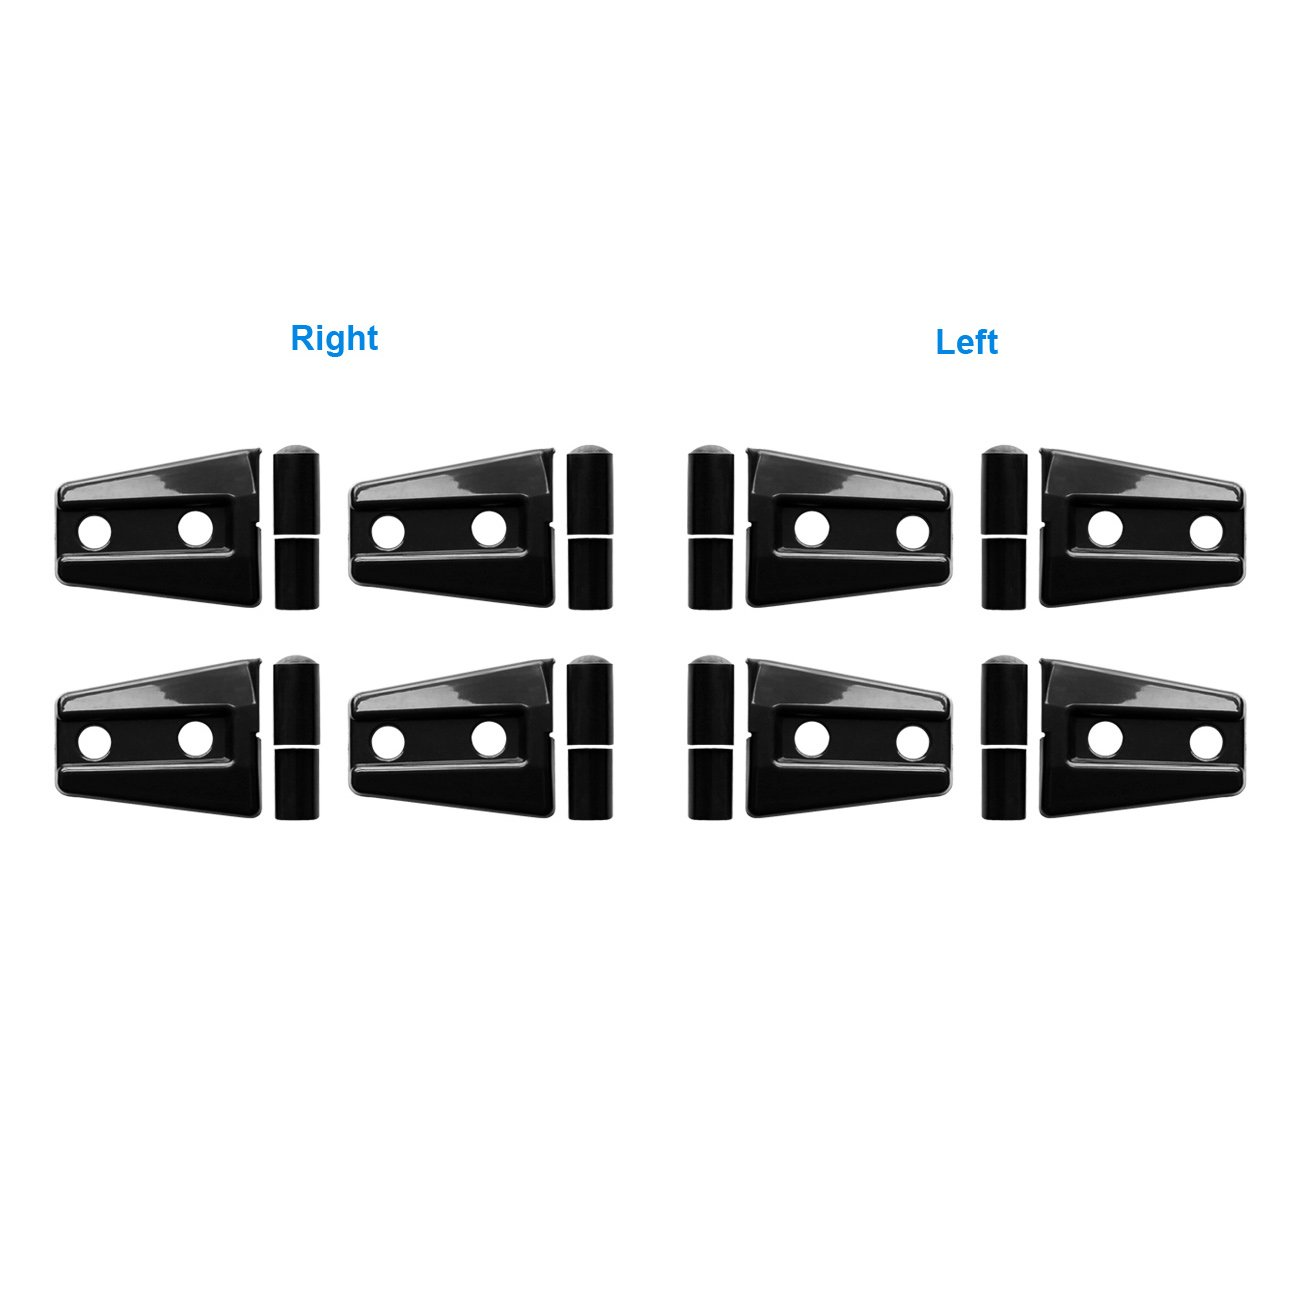 DIYTUNINGS 8 Pcs Black Door Hinge Cover Trim for 4 door Jeep Wrangler JK JKU Unlimited Rubicon Sahara X Off Road Sport Exterior Accessories Parts 2007-2017